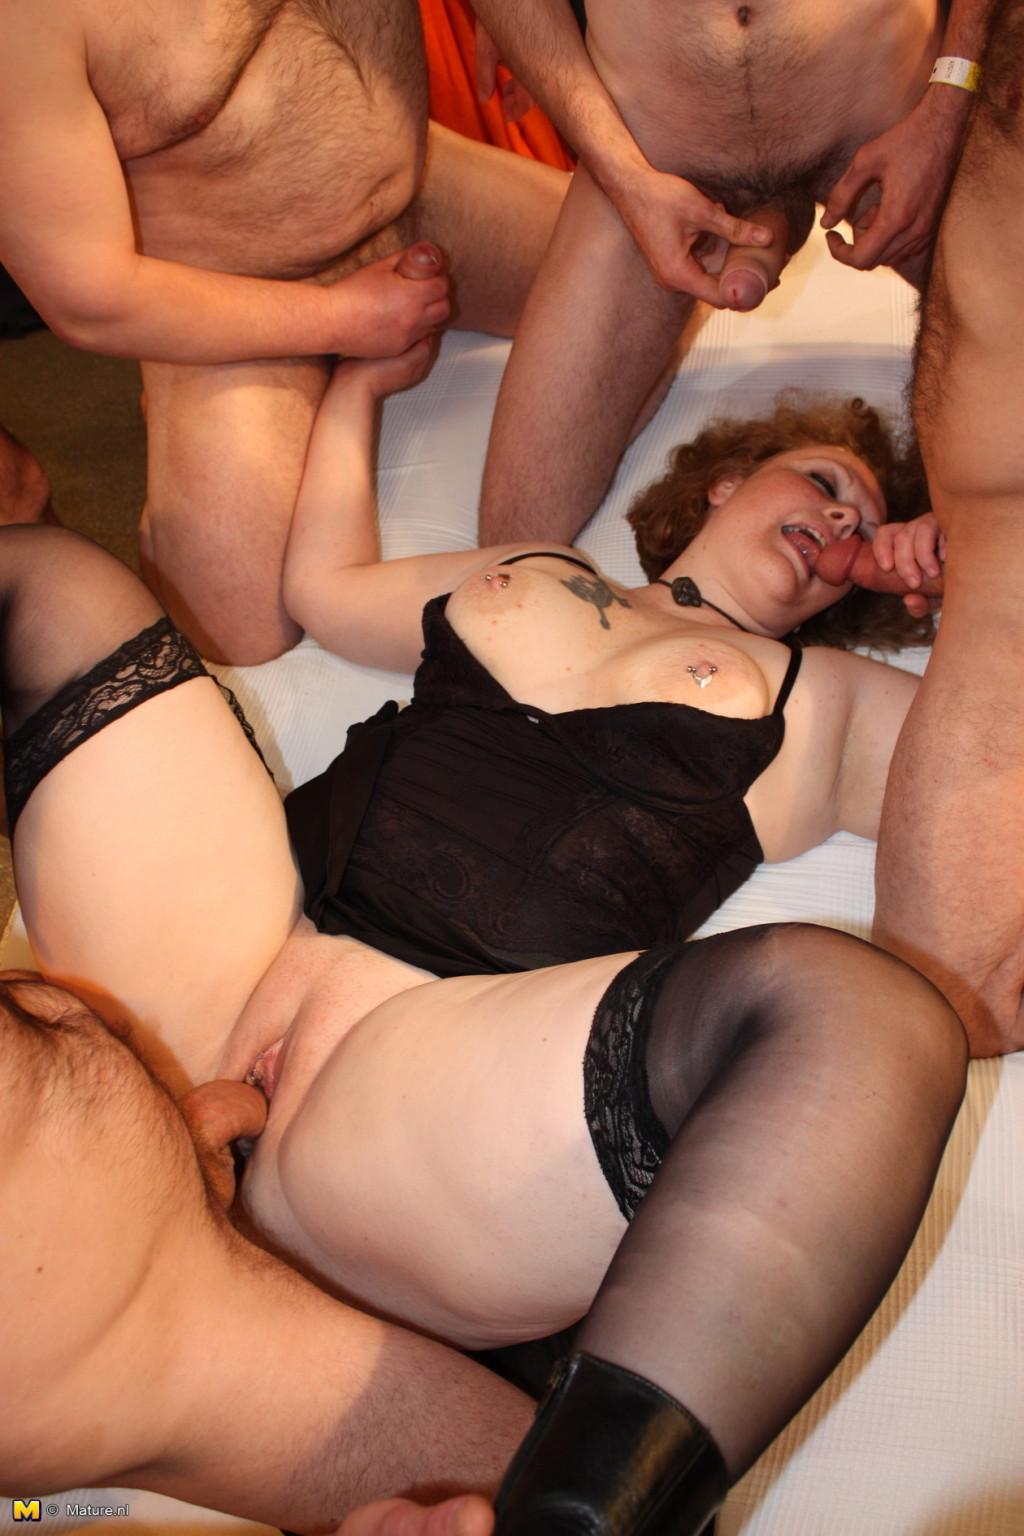 Жена мастурбирует пока мужа нет порно фото